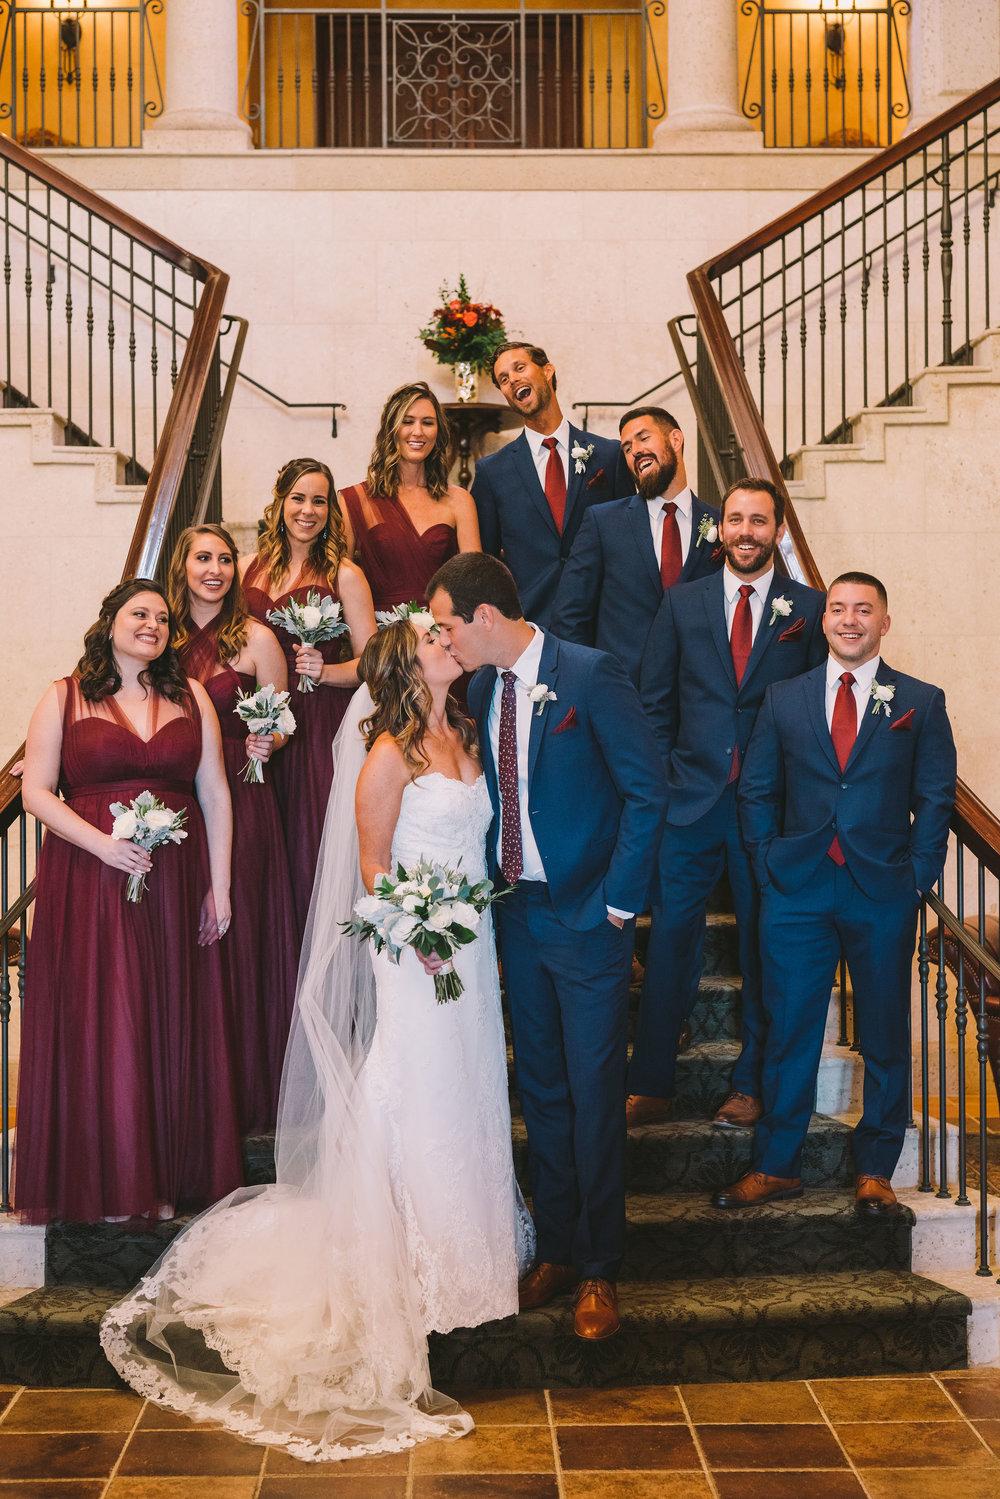 JesseandLex_181110_KeelyGreg_Wedding_BridalParty-4.jpg